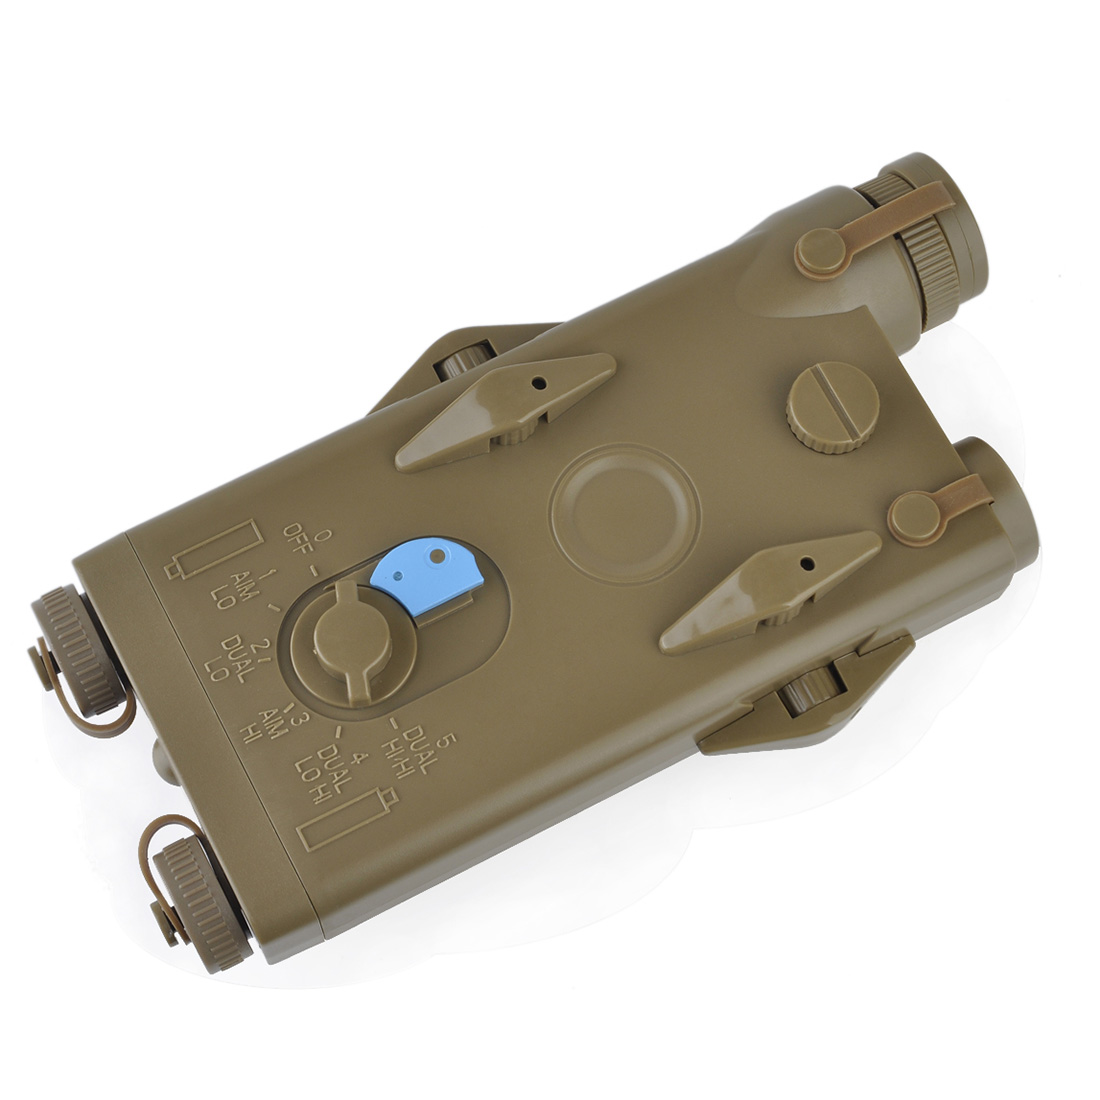 Element ANPEQ-2 Red Laser Battery Case For 20mm Width Rail - Tan/Black